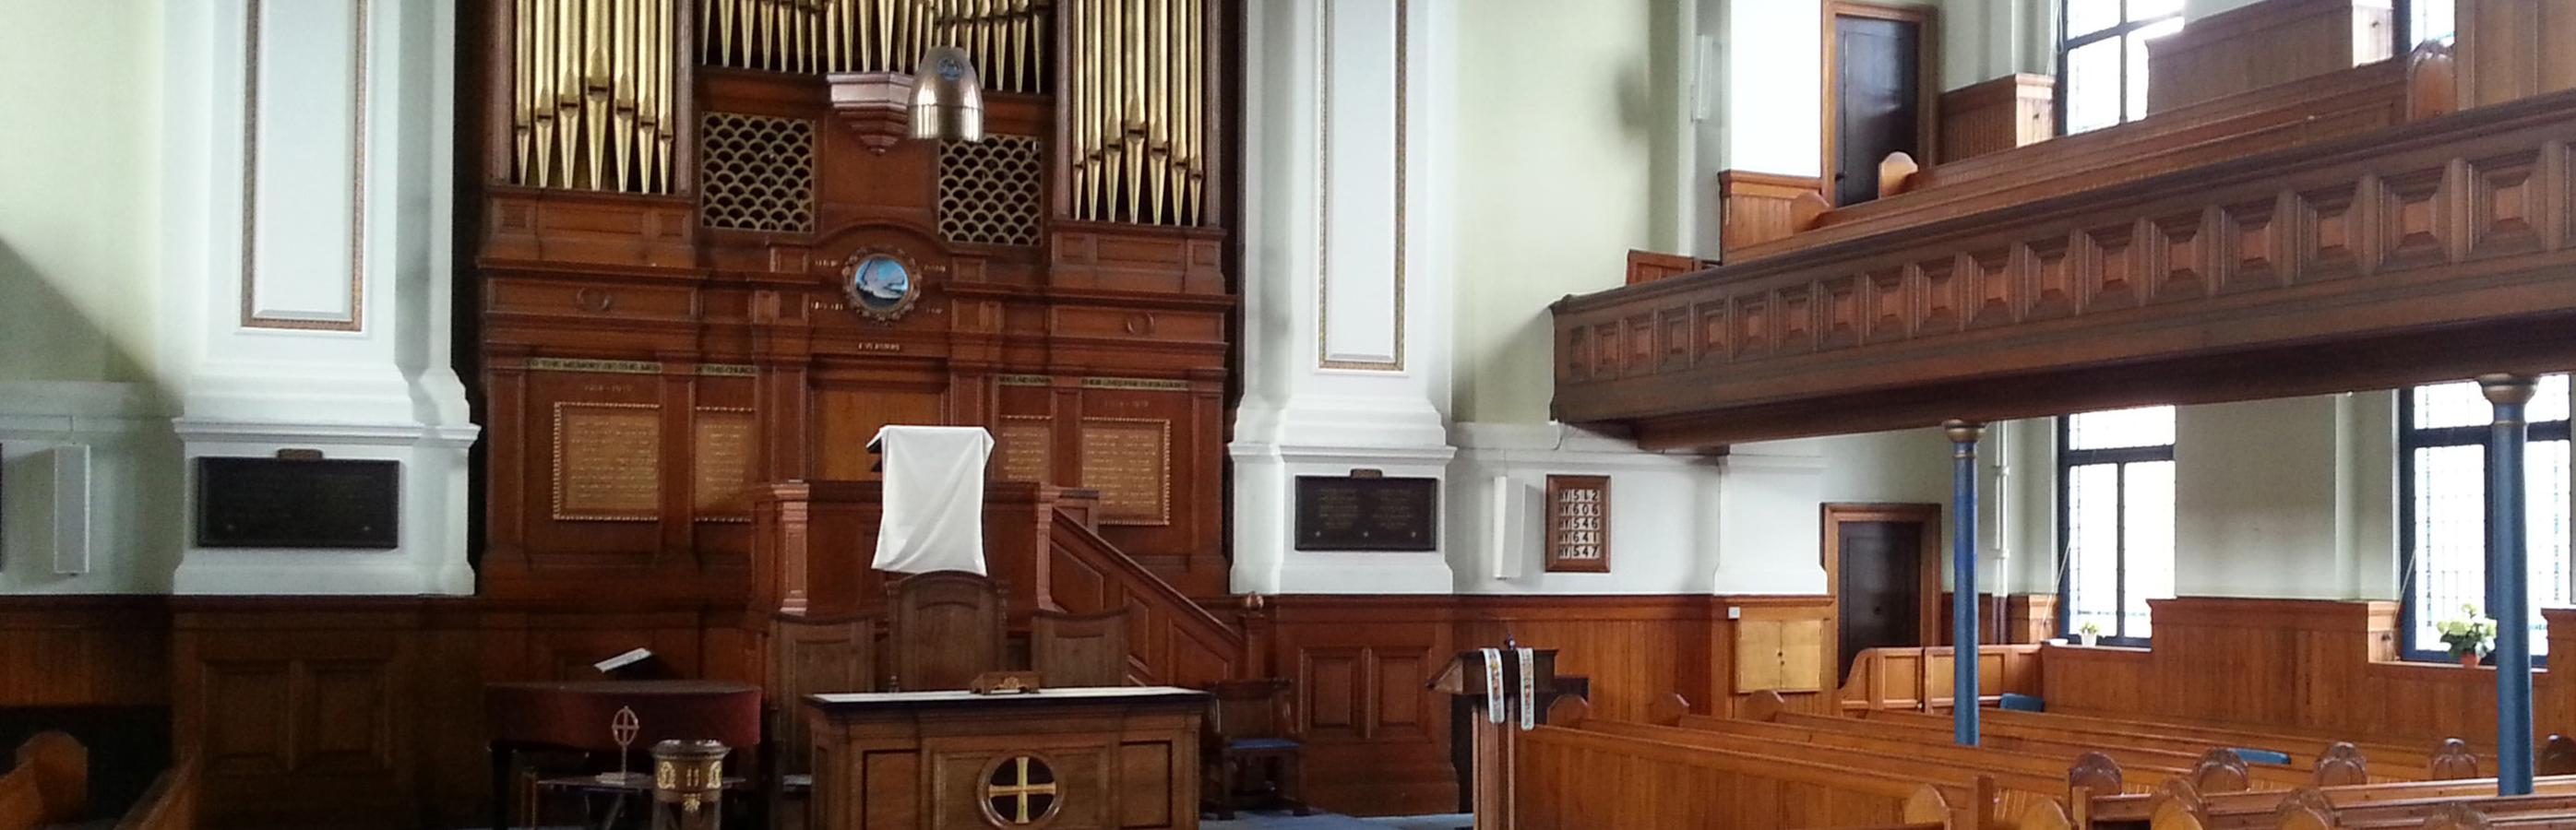 Wellington Church, Glasgow